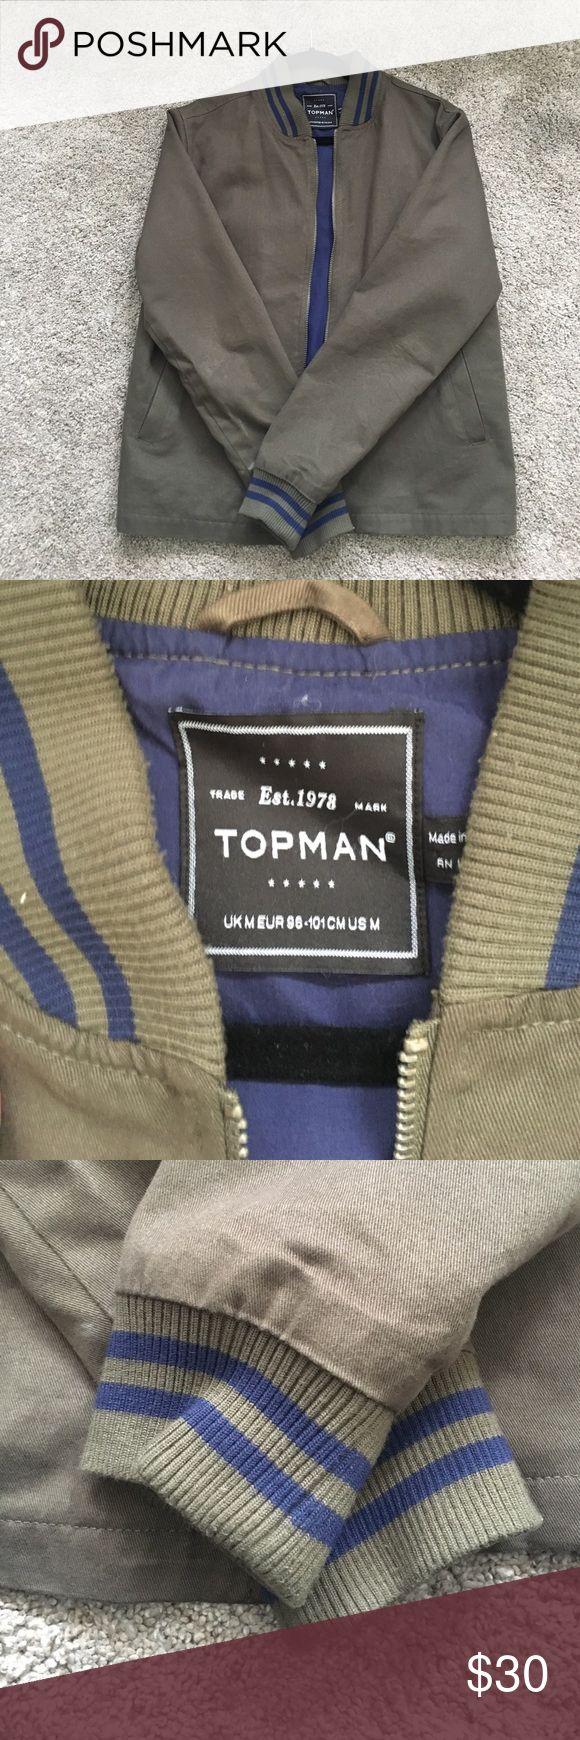 Topman bomber jacket Topman bomber jacket size med worn lightly Topman Jackets & Coats